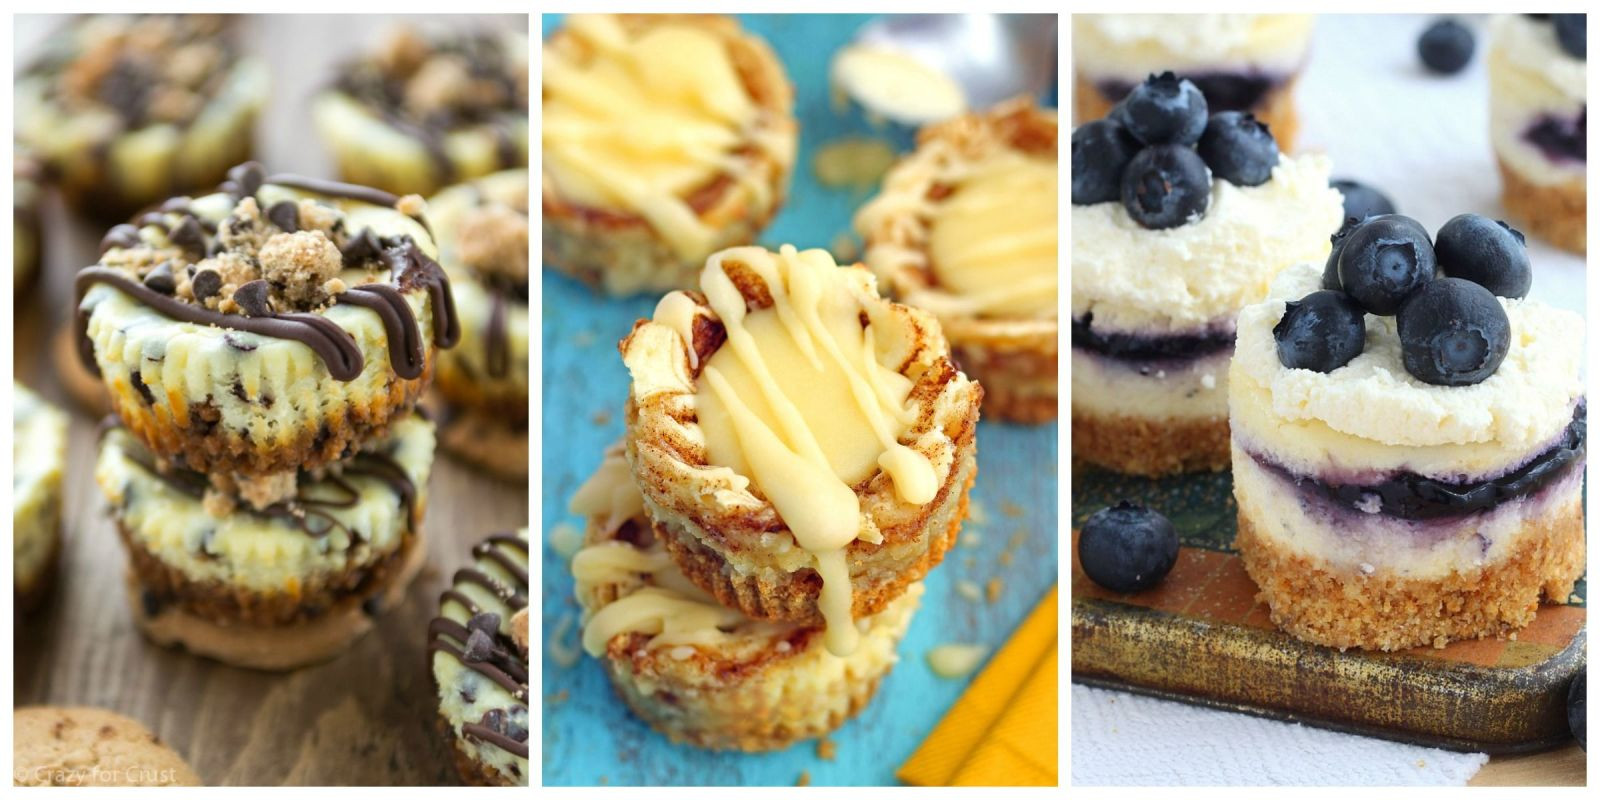 Small Cheesecake Recipe  25 Easy Mini Cheesecake Recipes Best Bite Size Cheesecakes